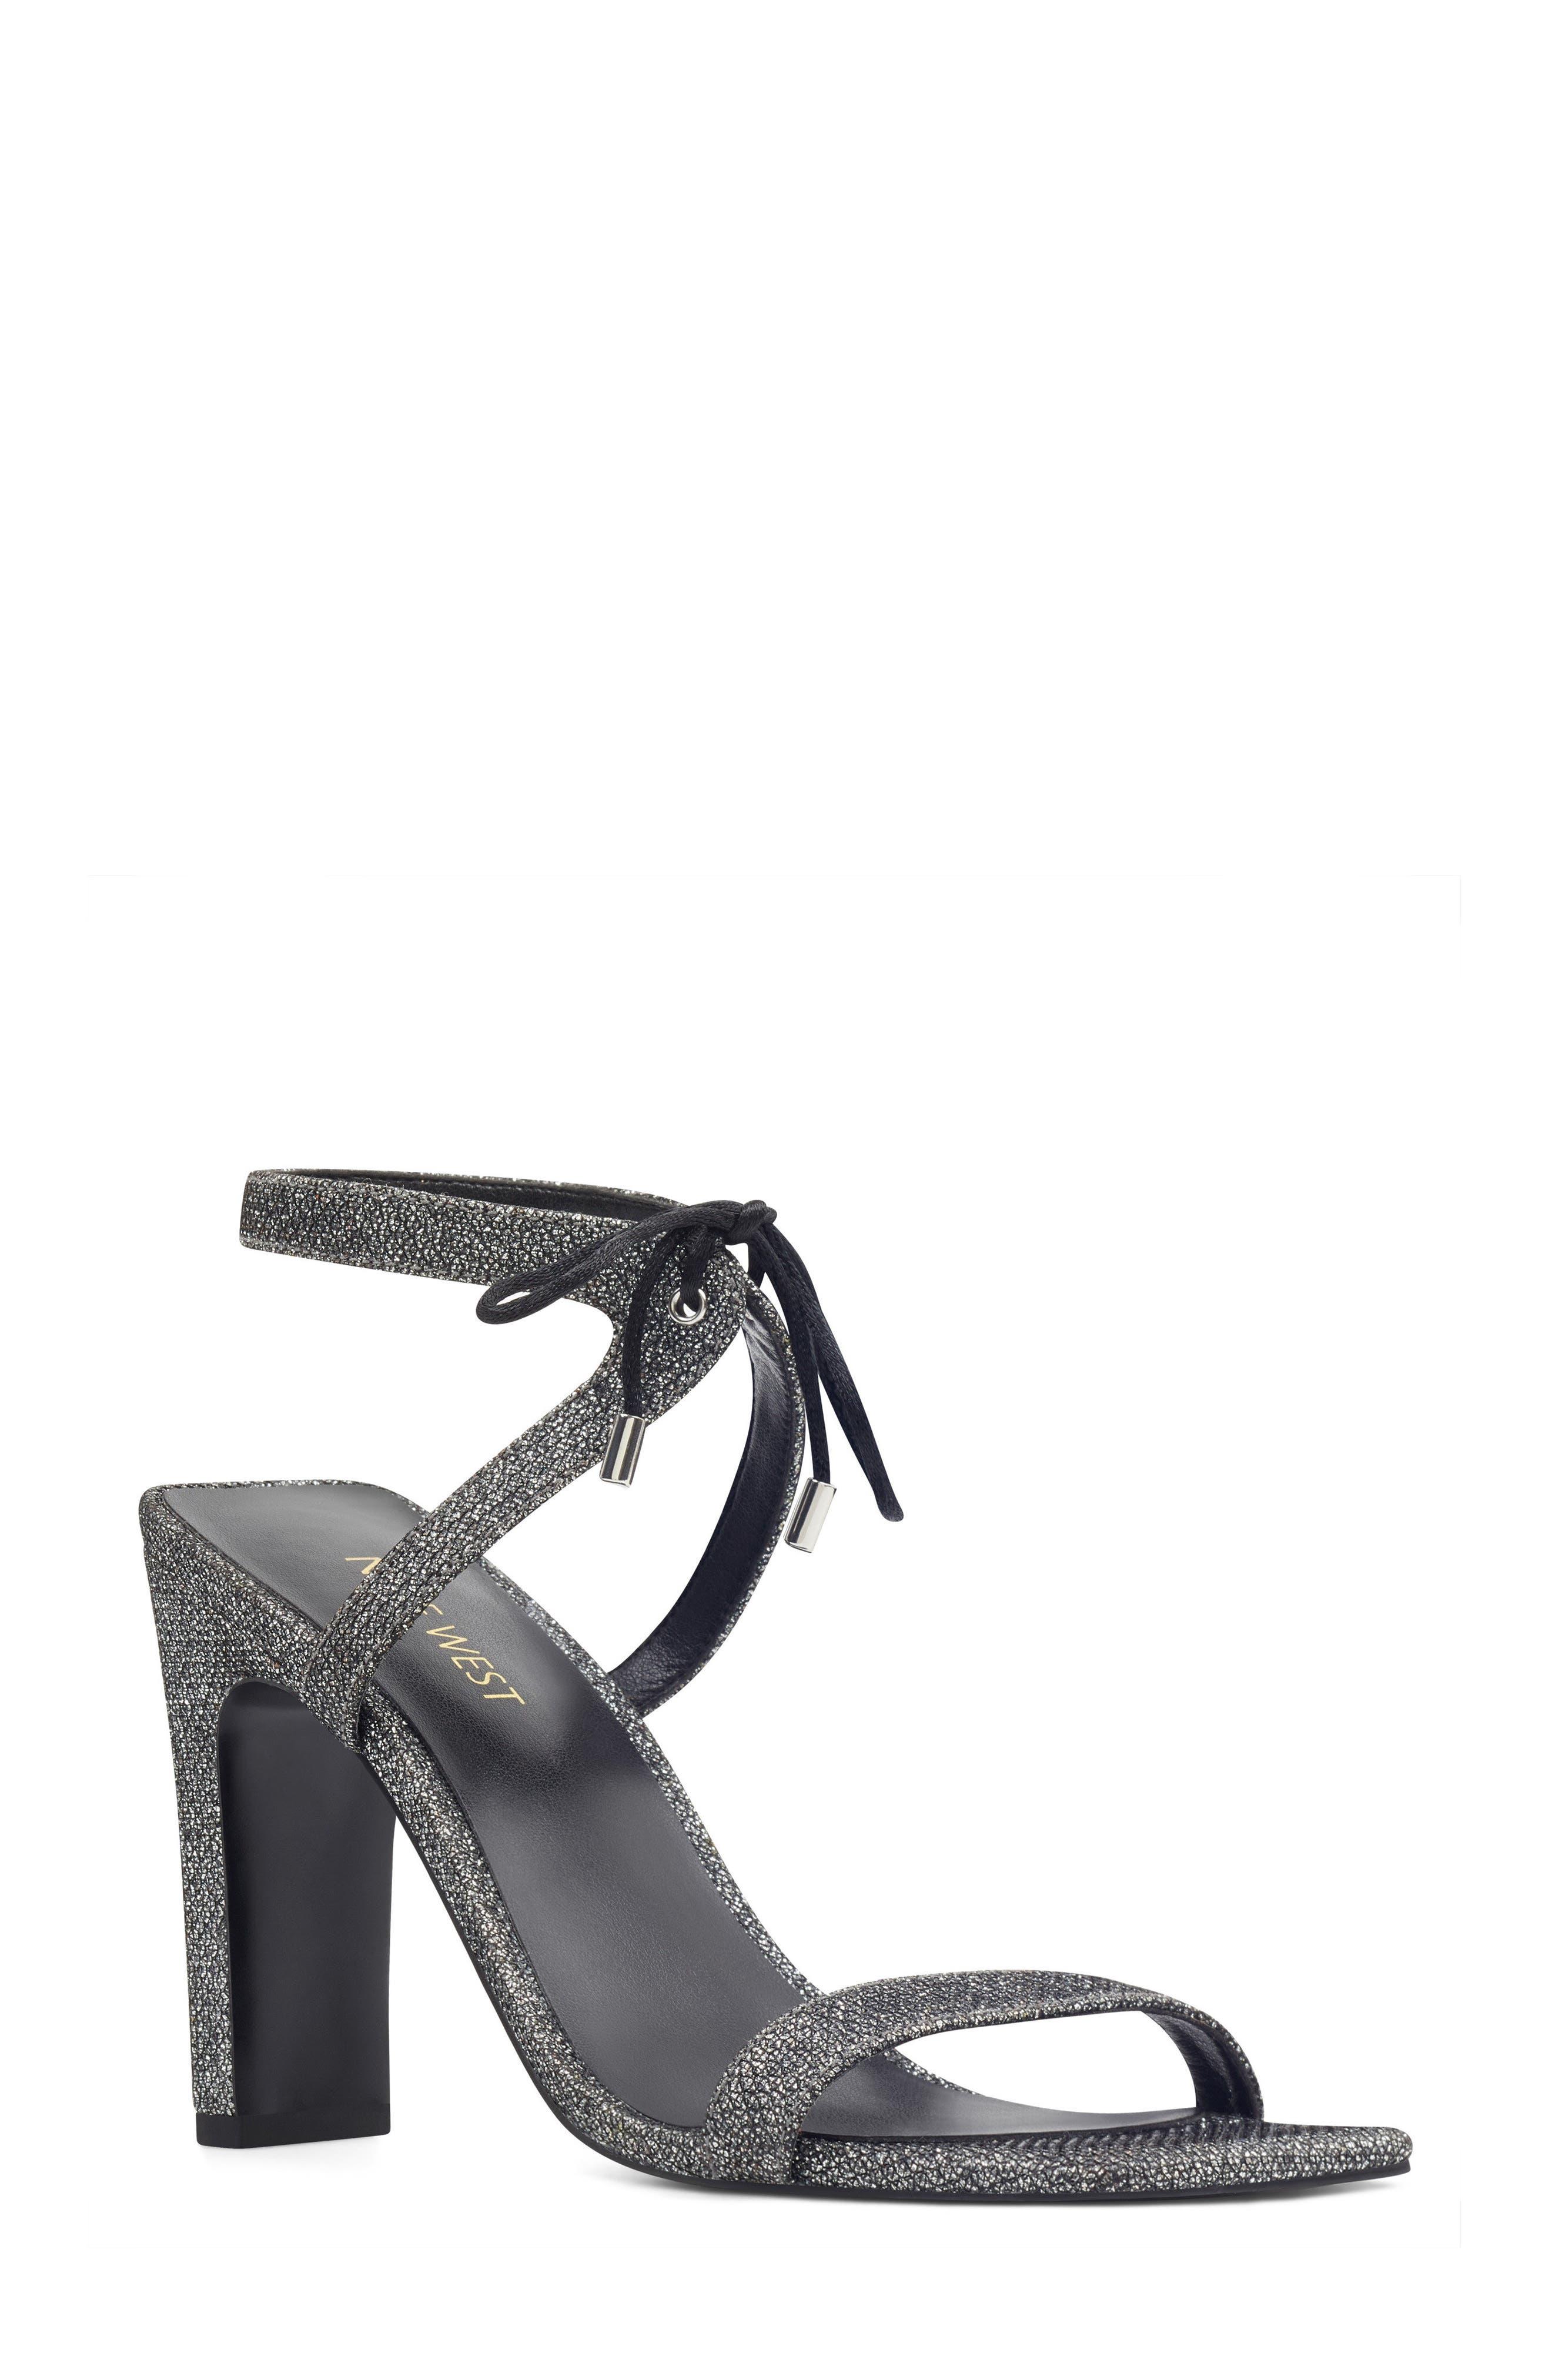 Longitano Squared Toe Sandal,                         Main,                         color, Black/ Silver Fabric